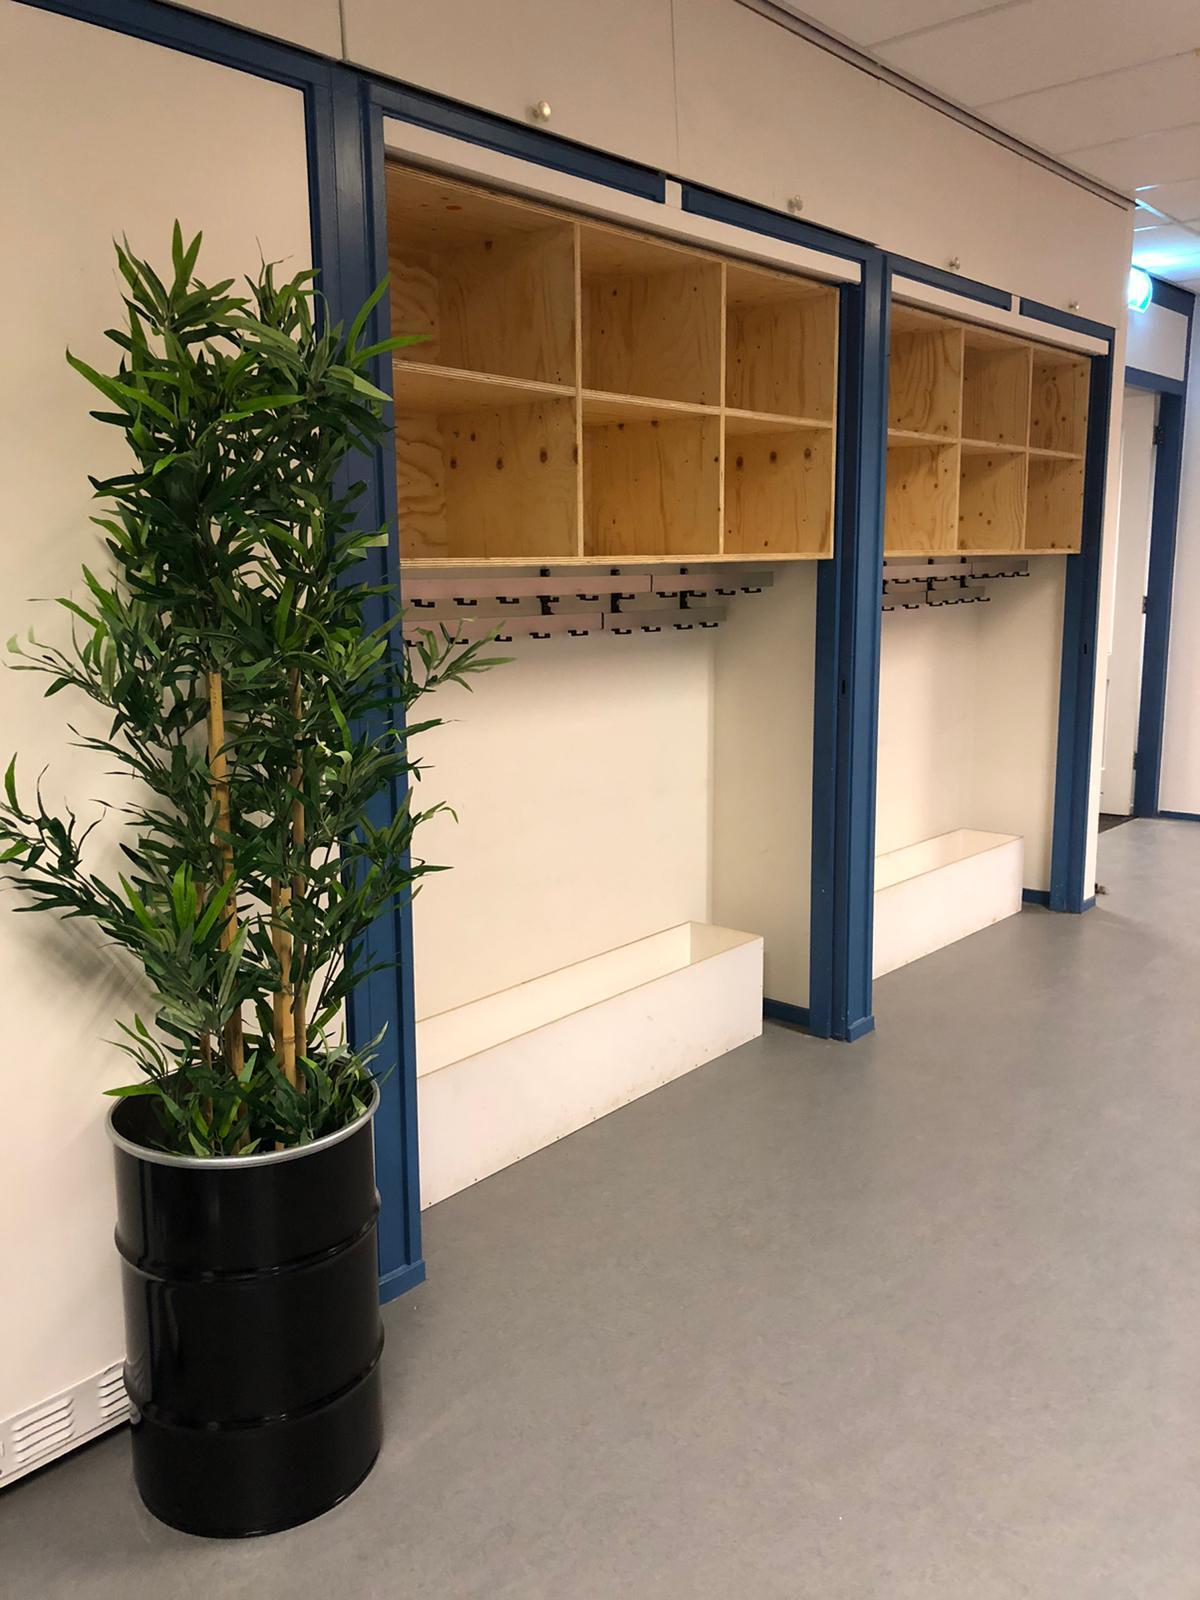 Interieur basisschool De Bron